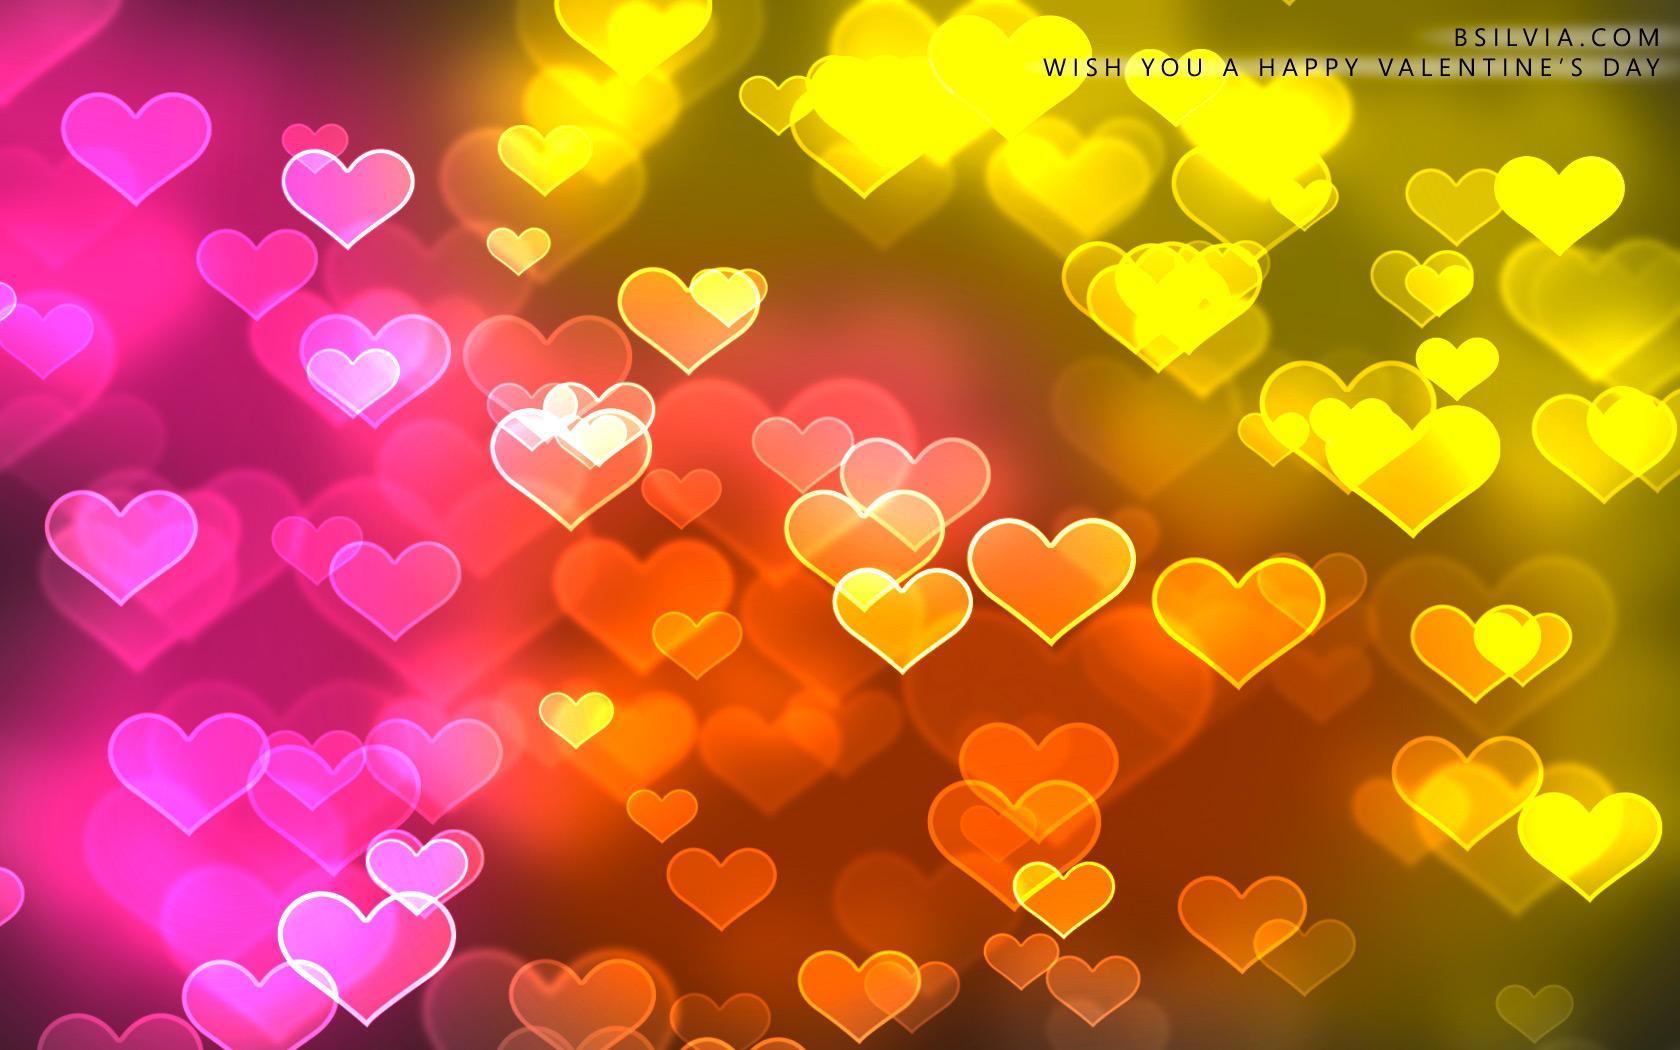 1680x1050 Wish you a happy Valentine desktop PC and Mac wallpaper 1680x1050